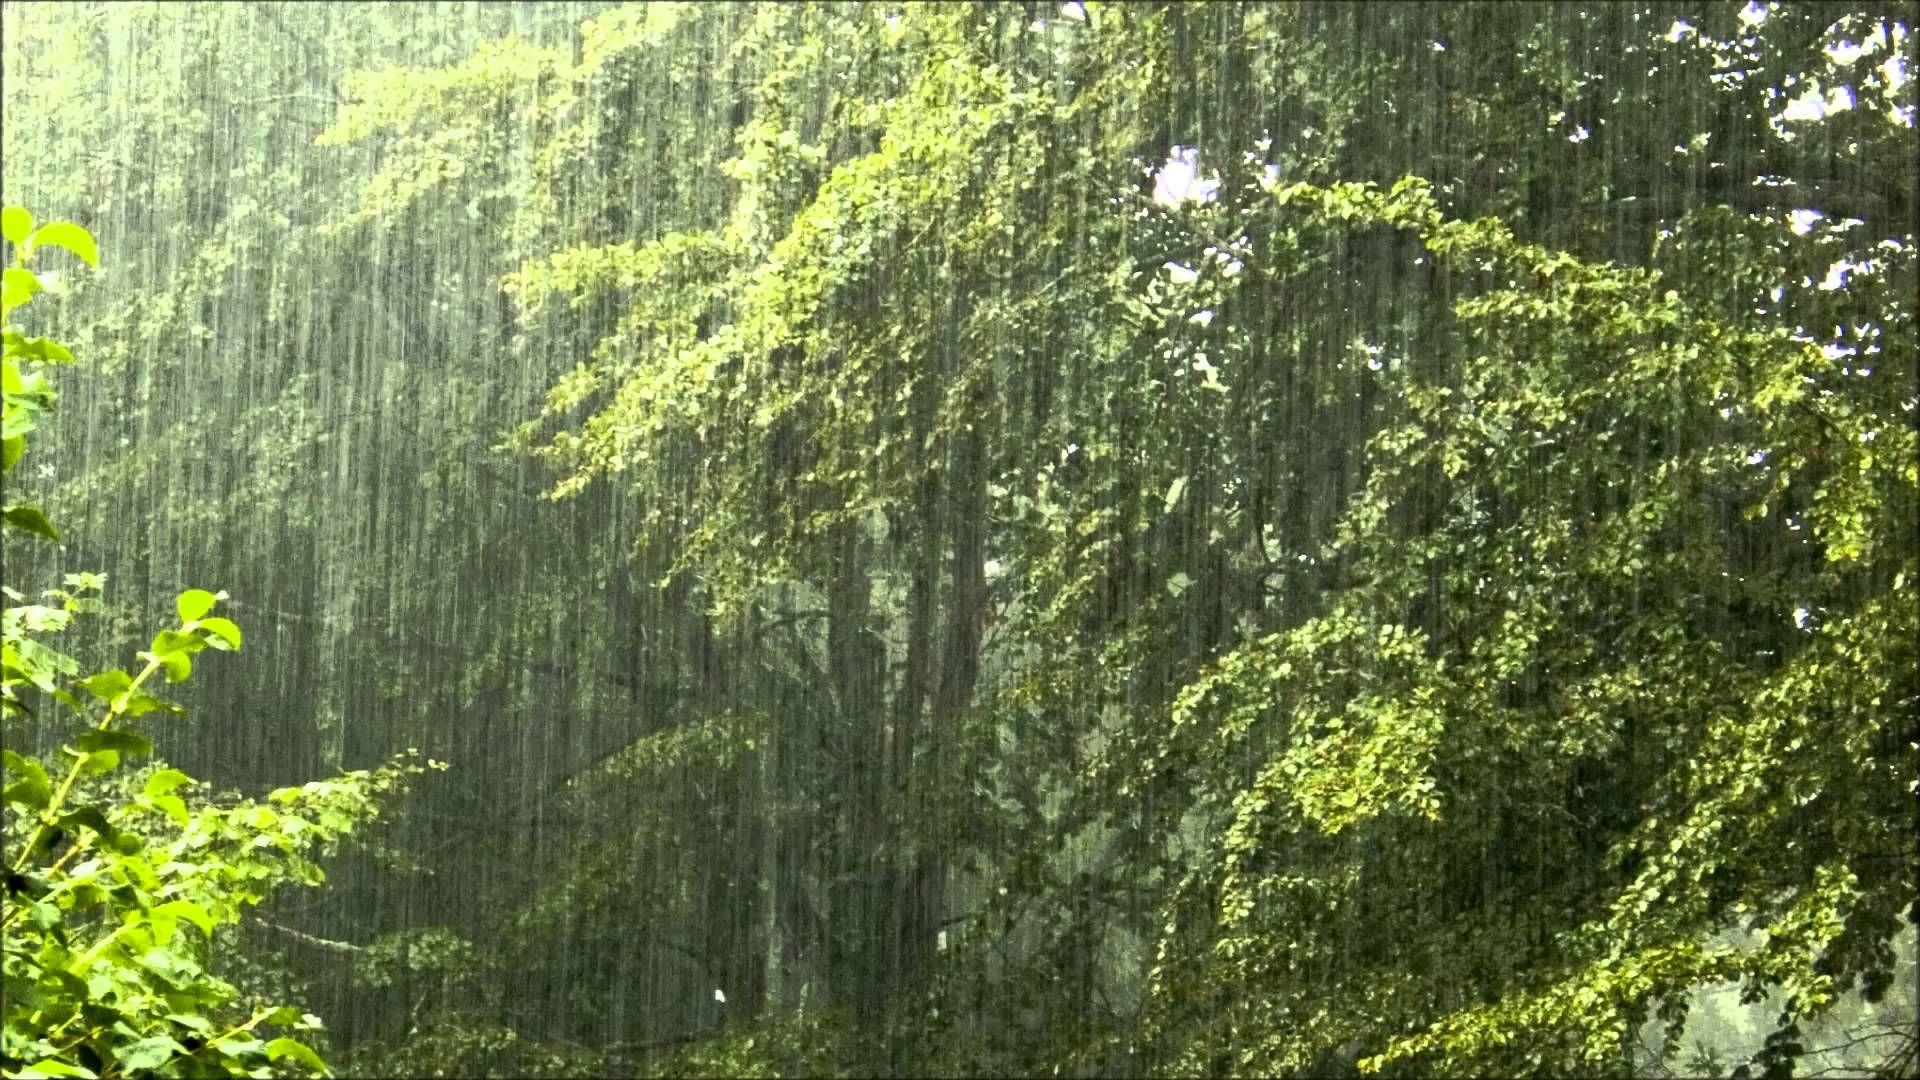 Torrential rain - relaxing rain with nature sounds | Nature | Rain